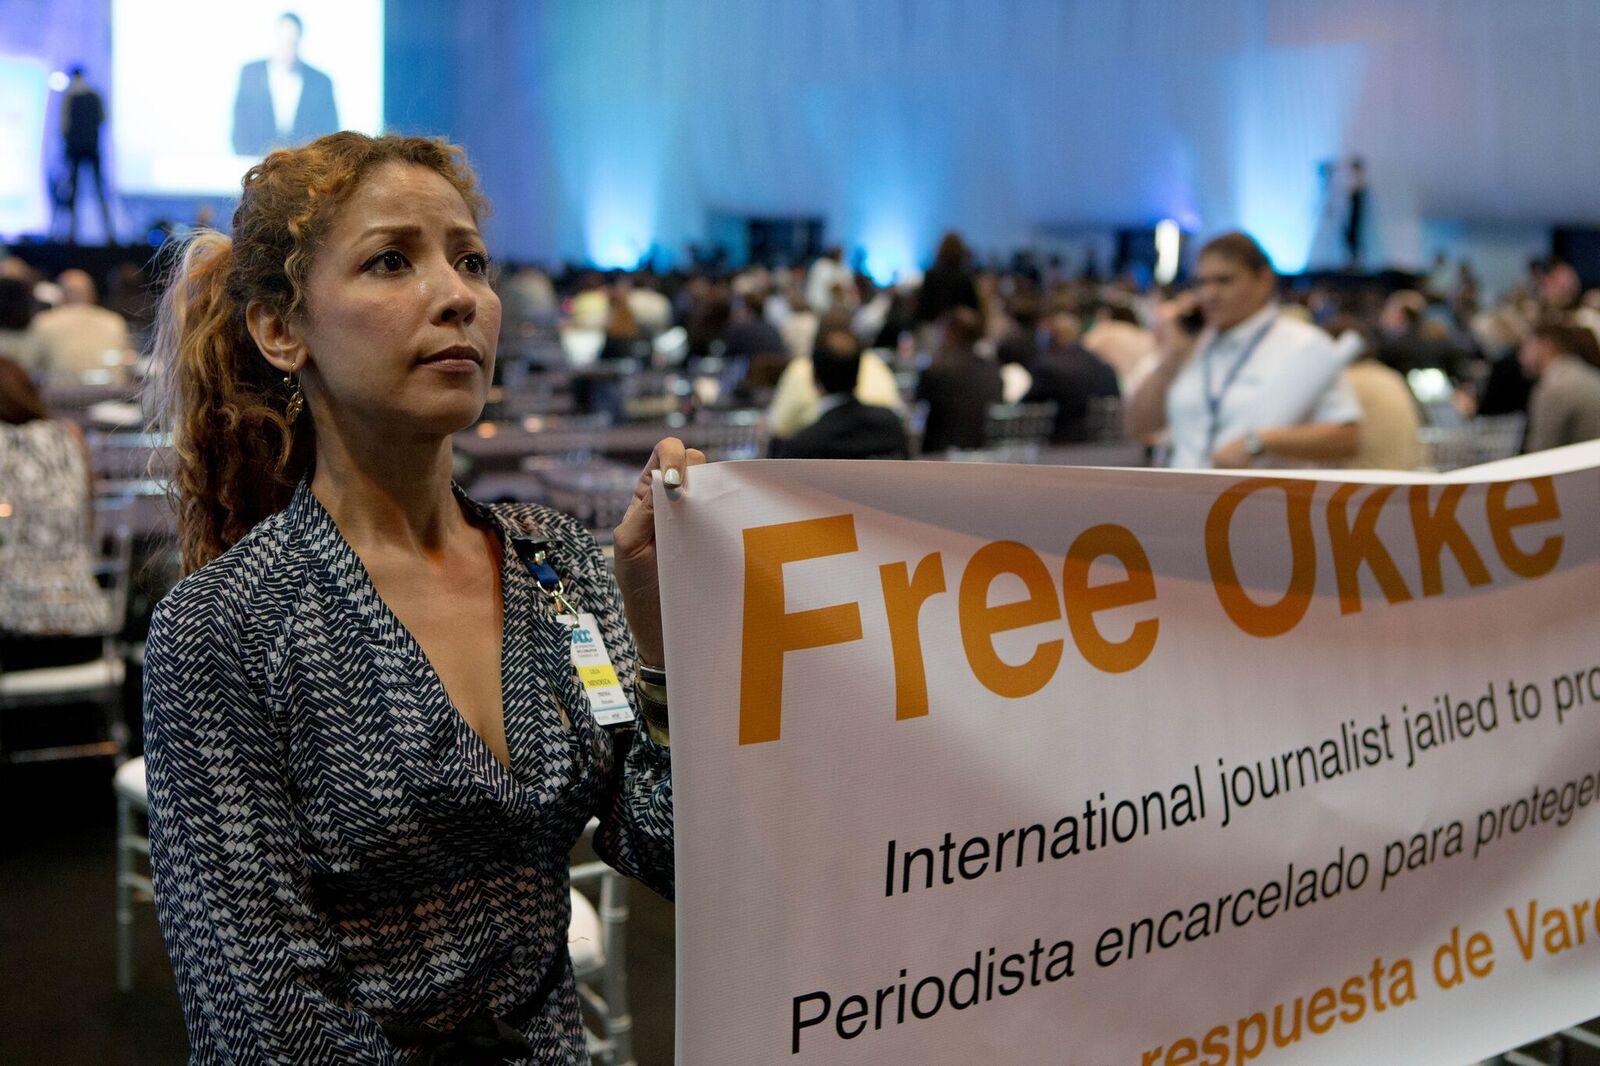 Demonstrators demand Dutch journalist's release during Panamanian President Varela's speech